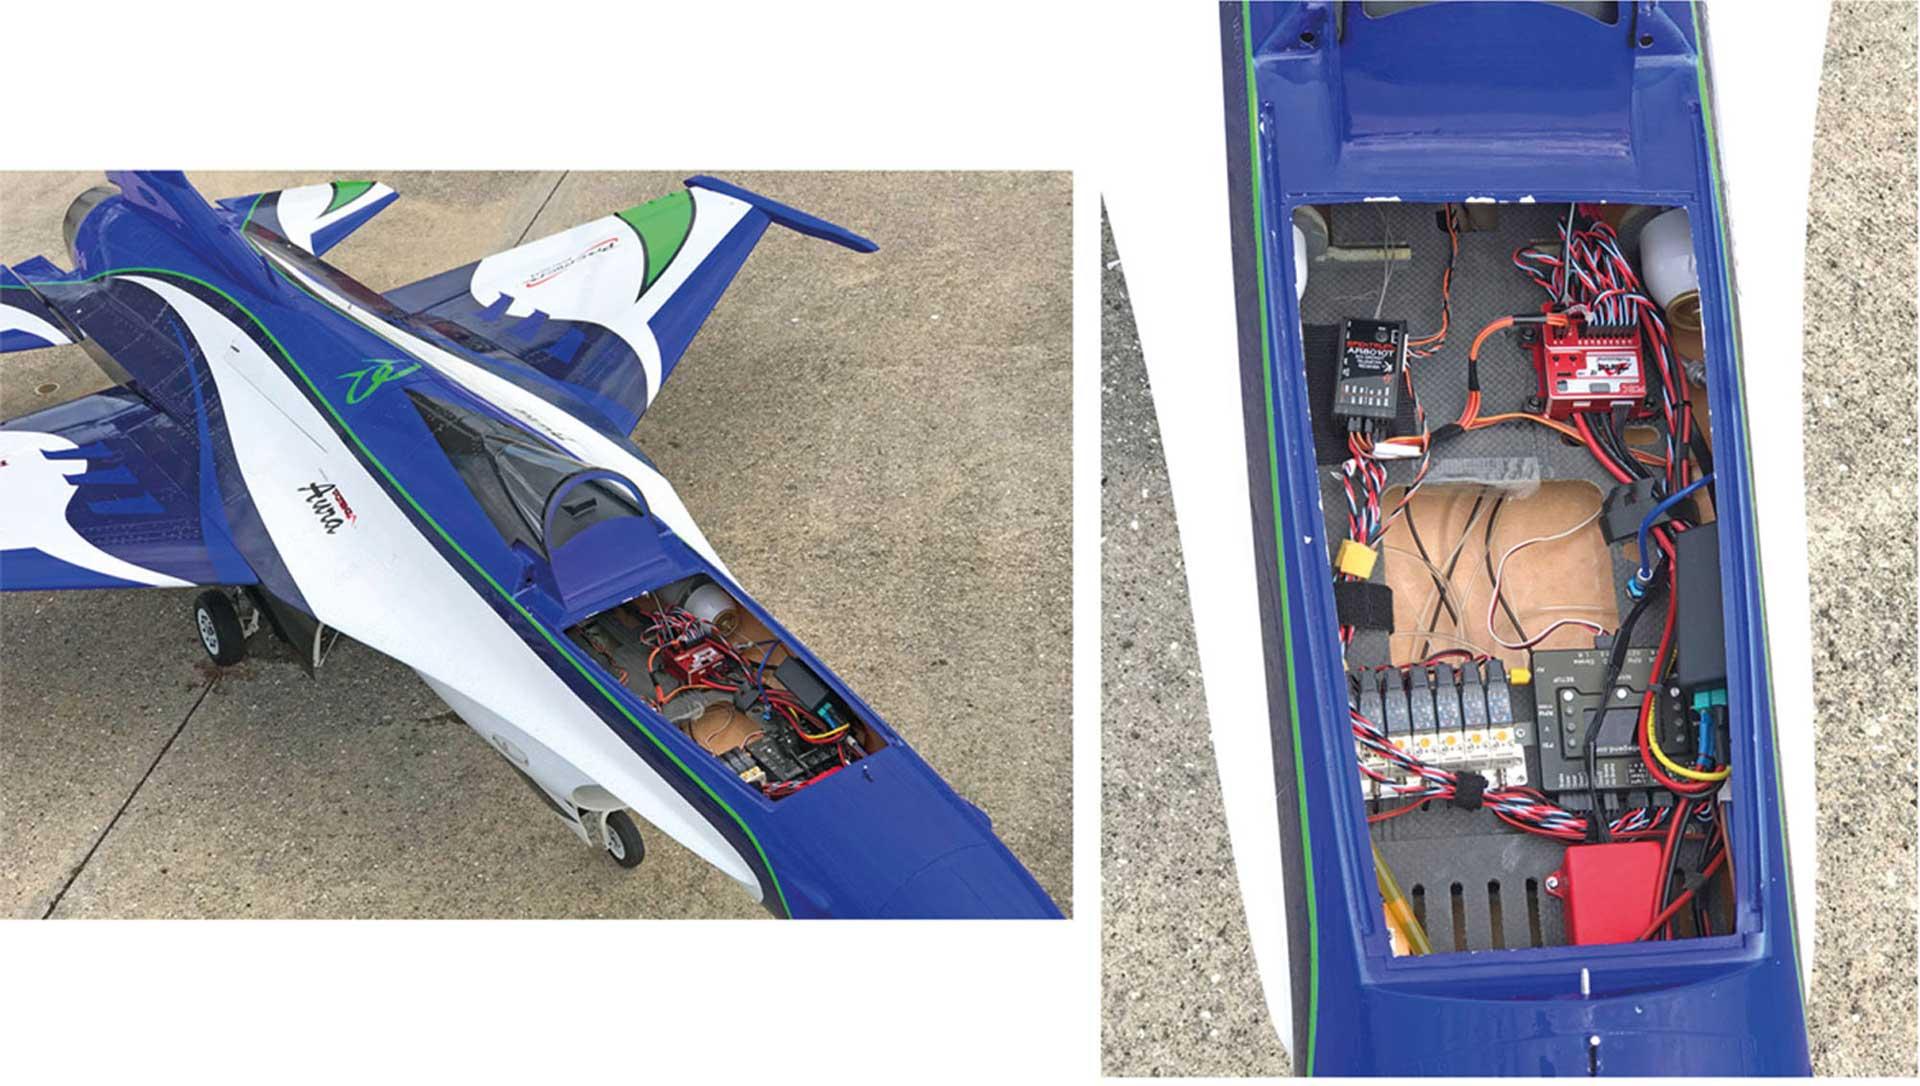 FLEX INNOVATIONS AURA 8 PROFESSIONAL FLIGHT CONTROL